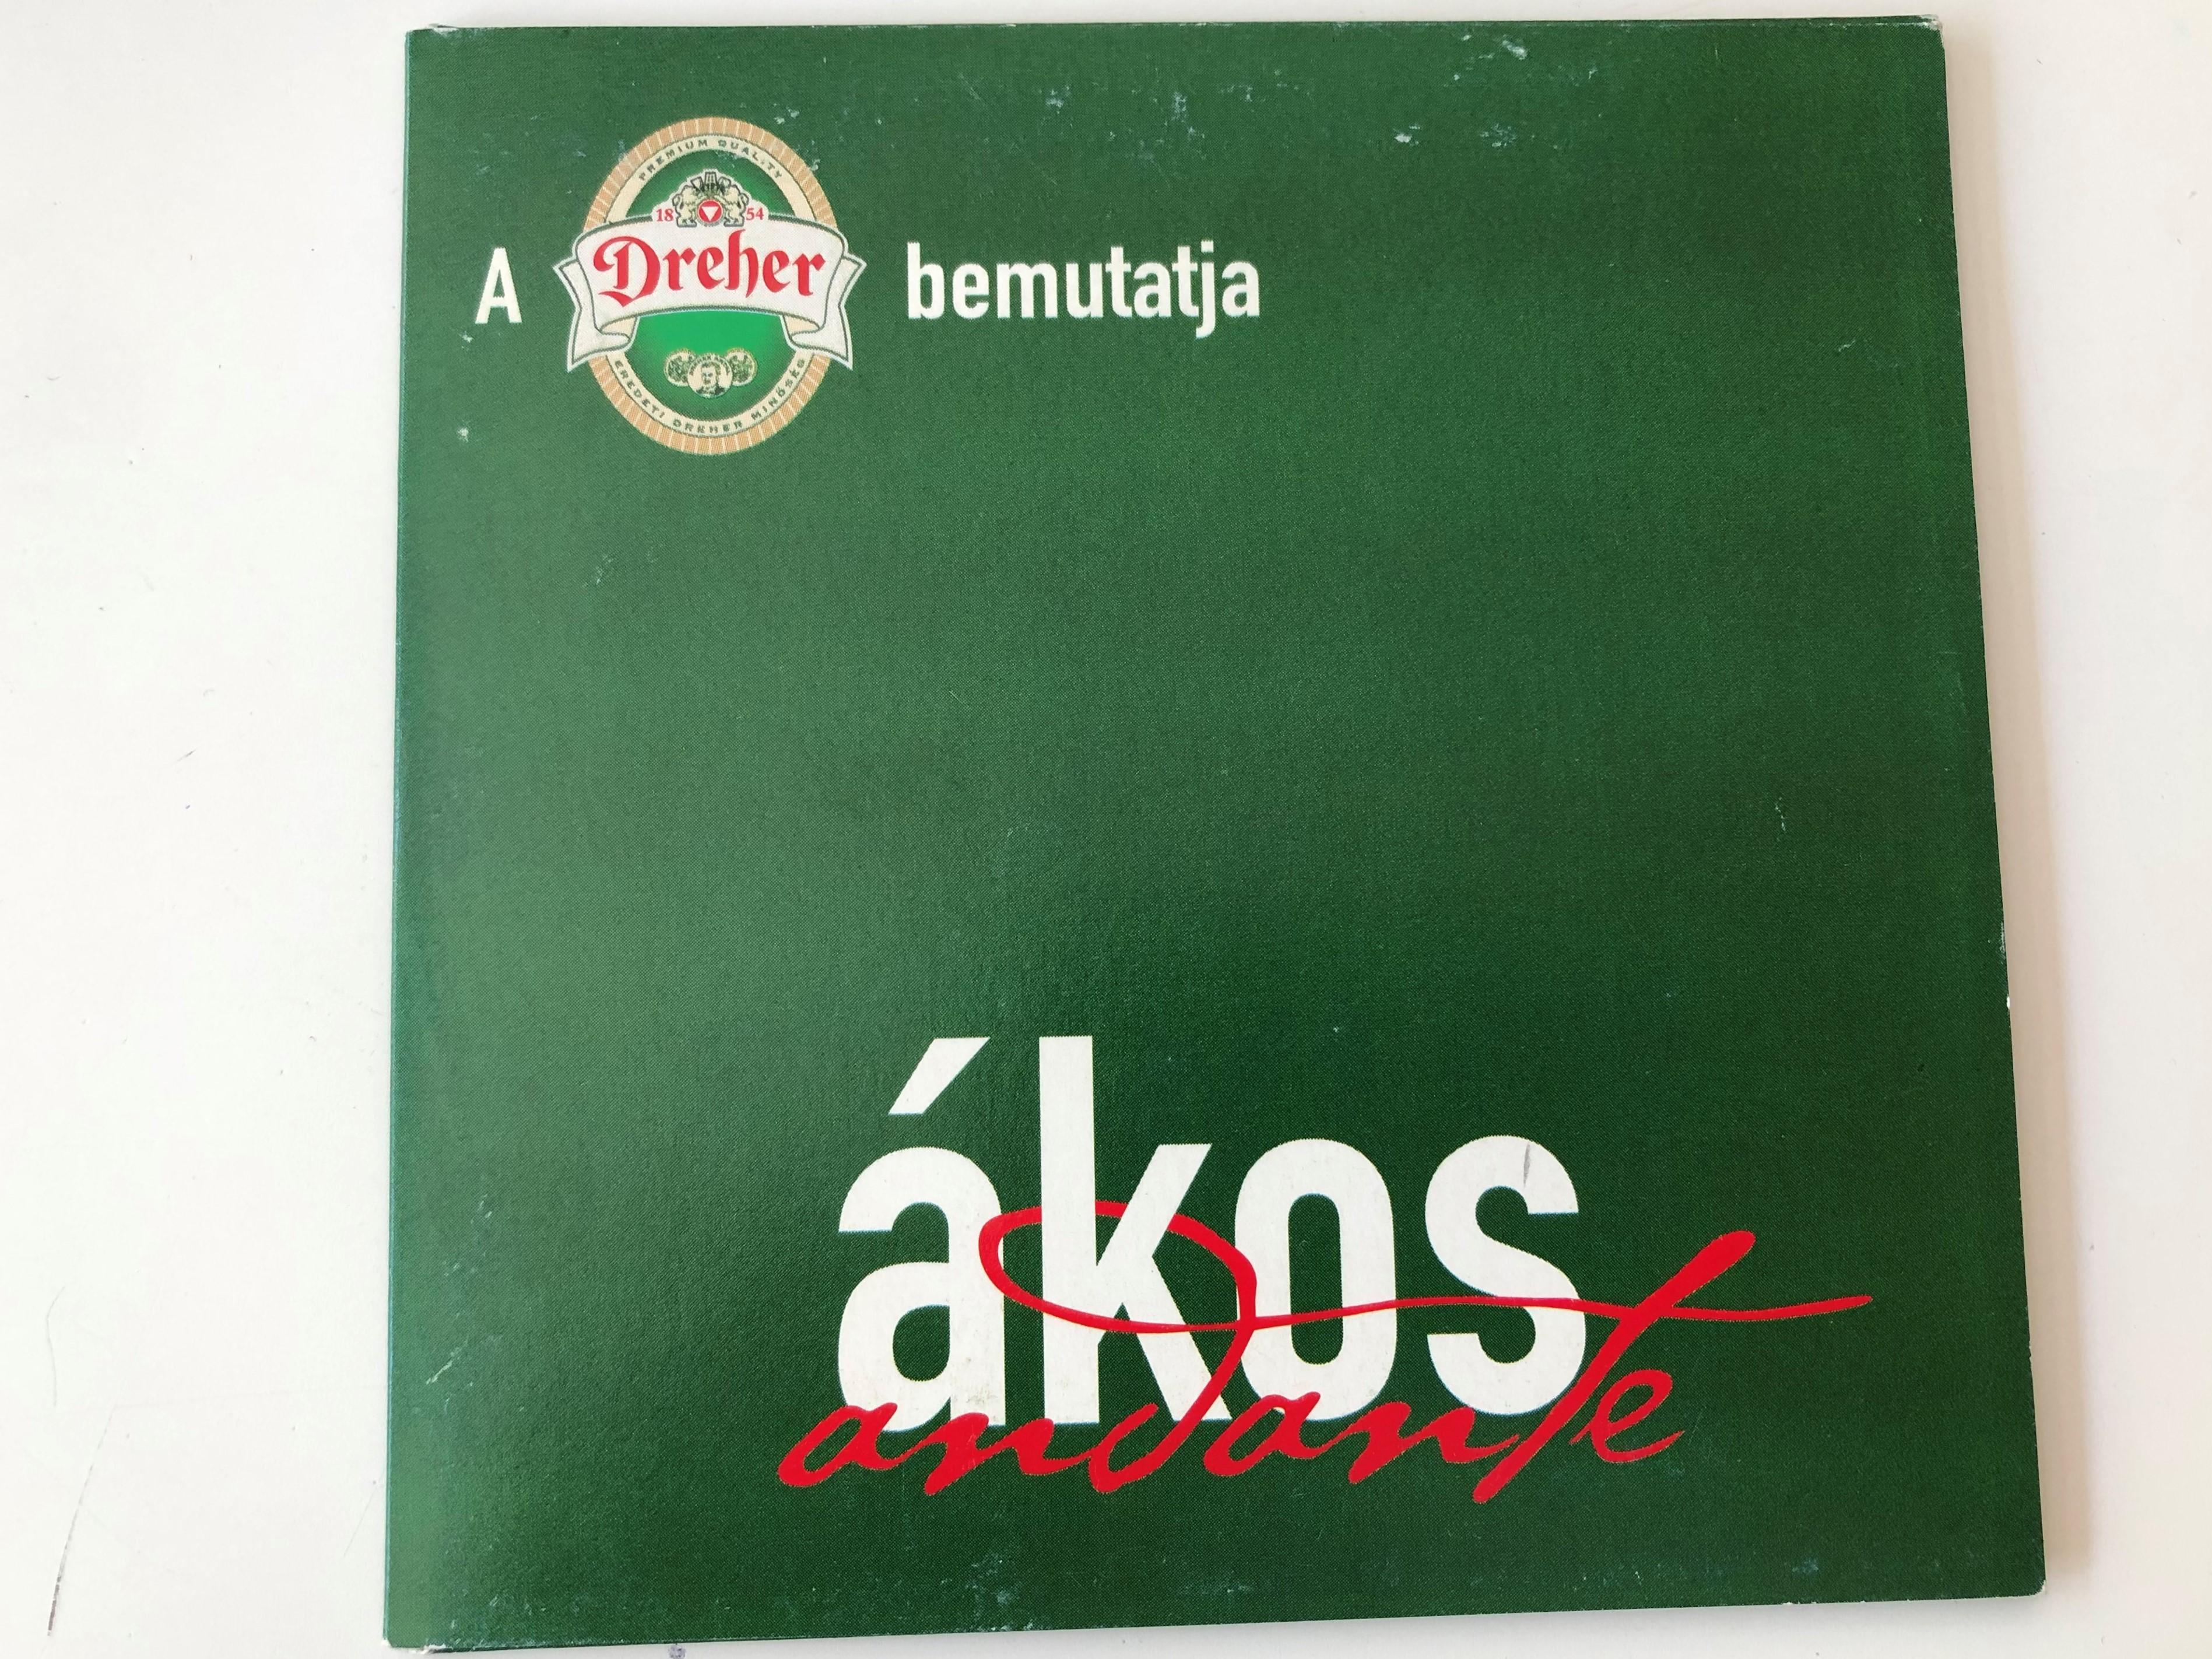 a-dreher-bemutatja-kos-adante-falconmedia-audio-cd-2003-5998638323323-1-.jpg